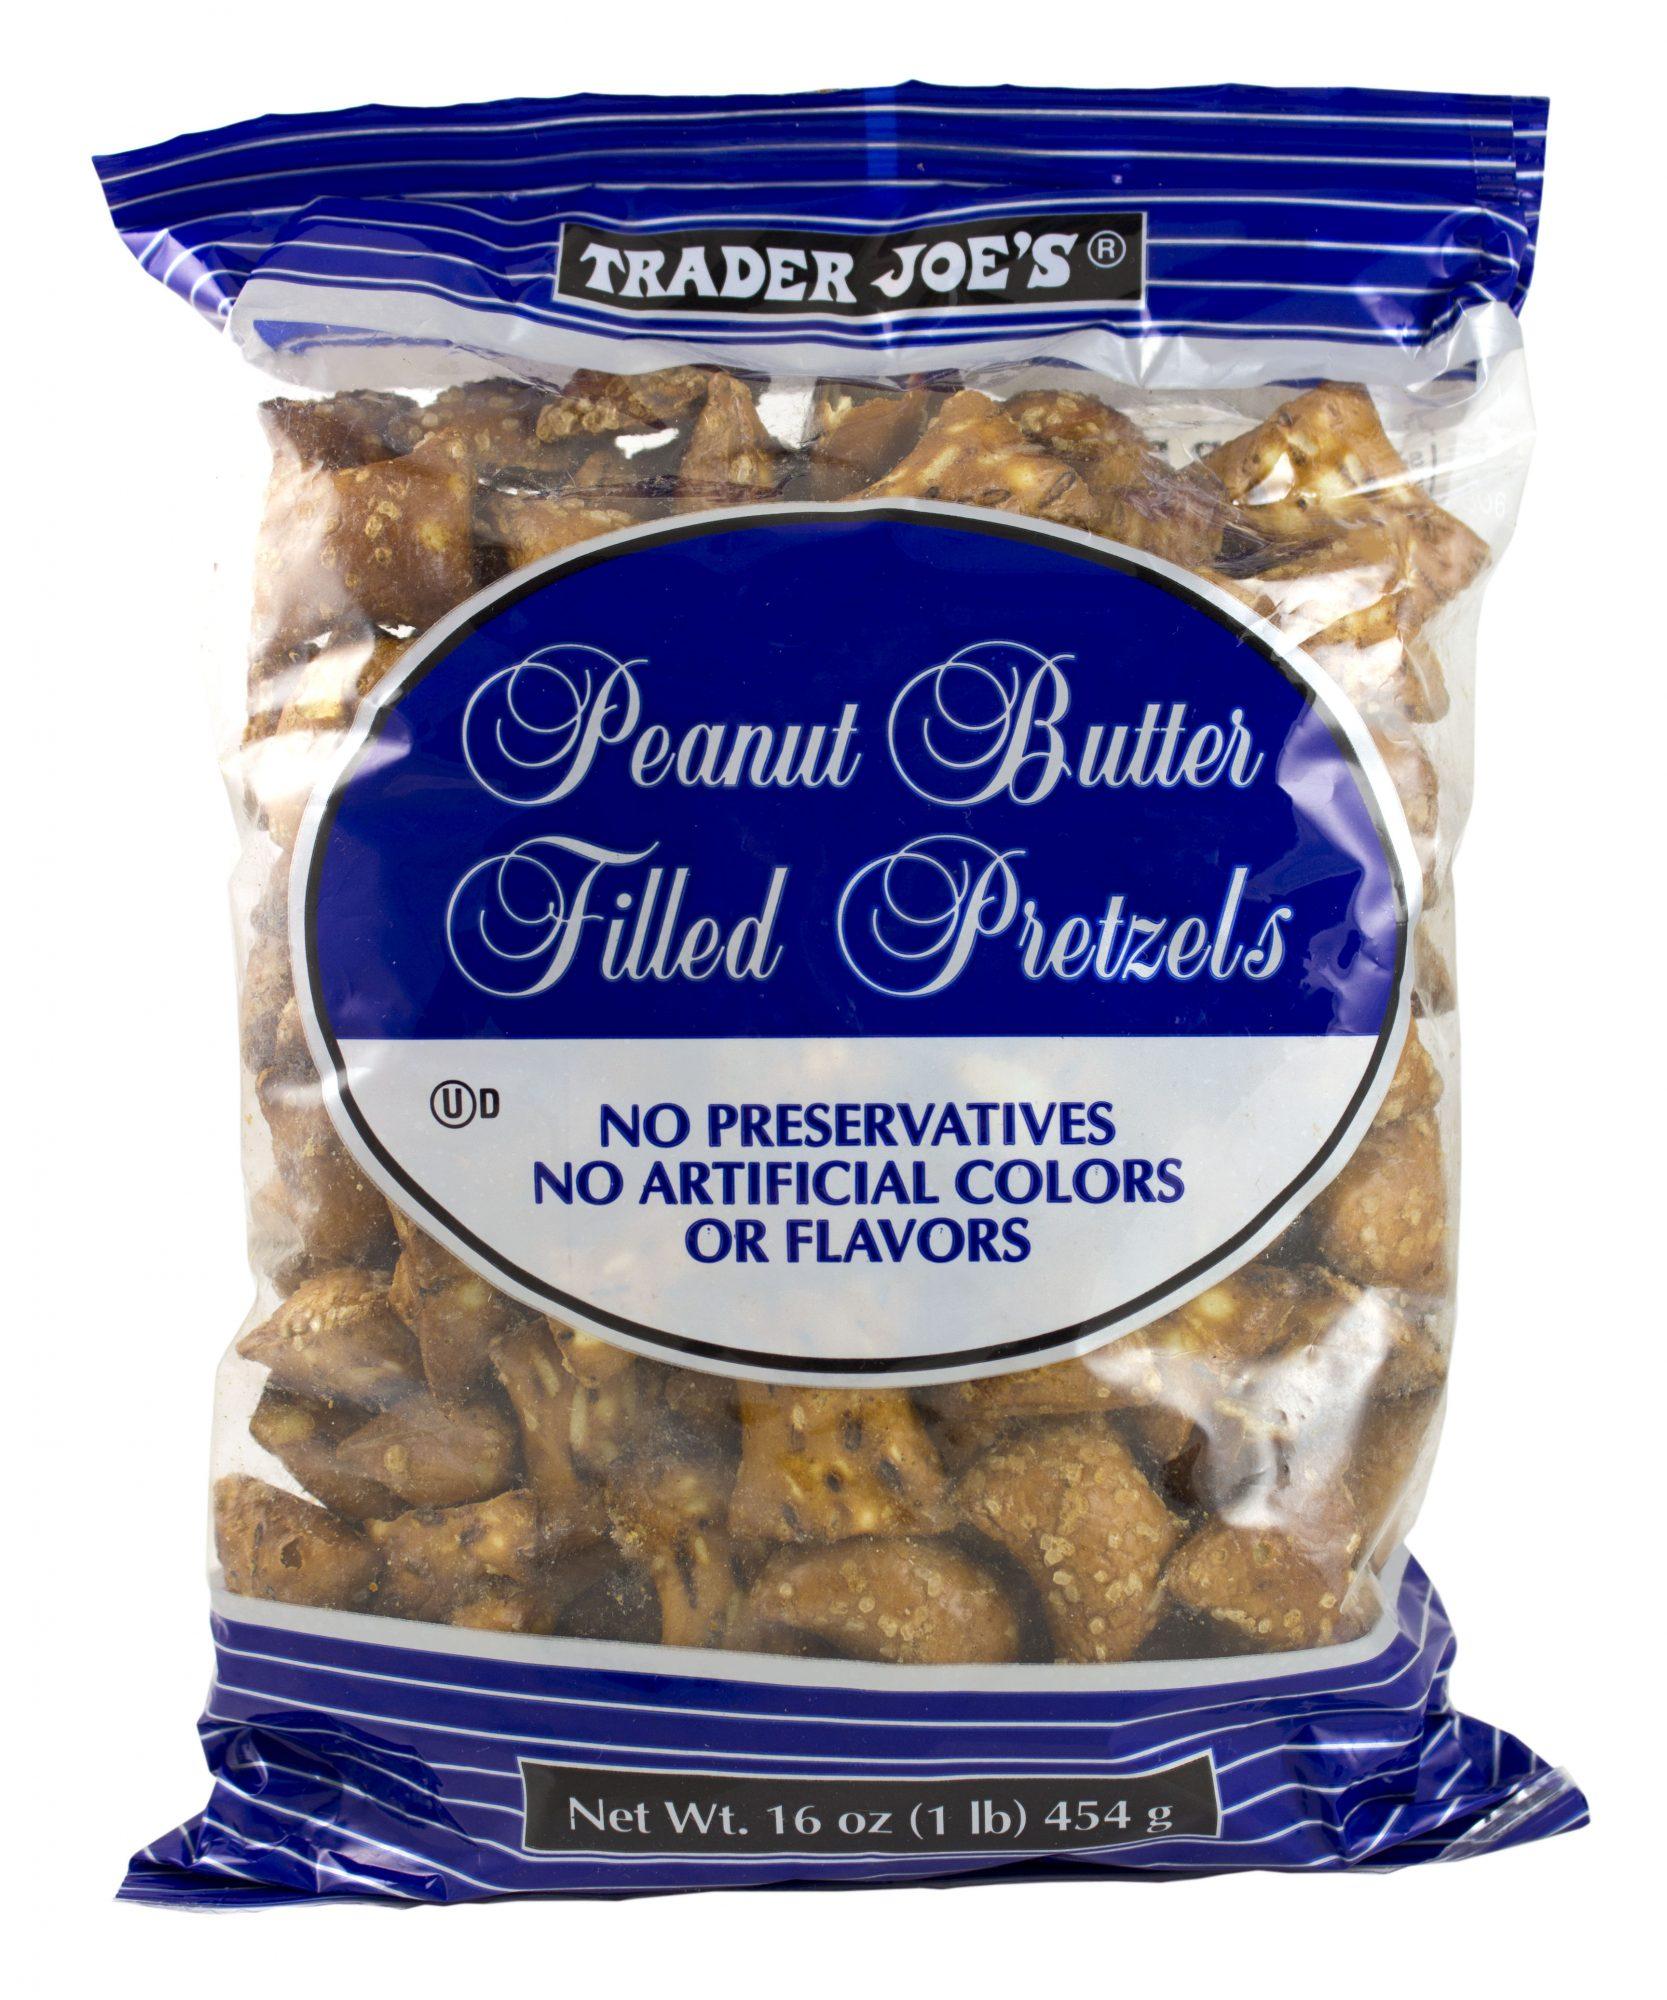 Peanut-Butter-Filled-Pretzels